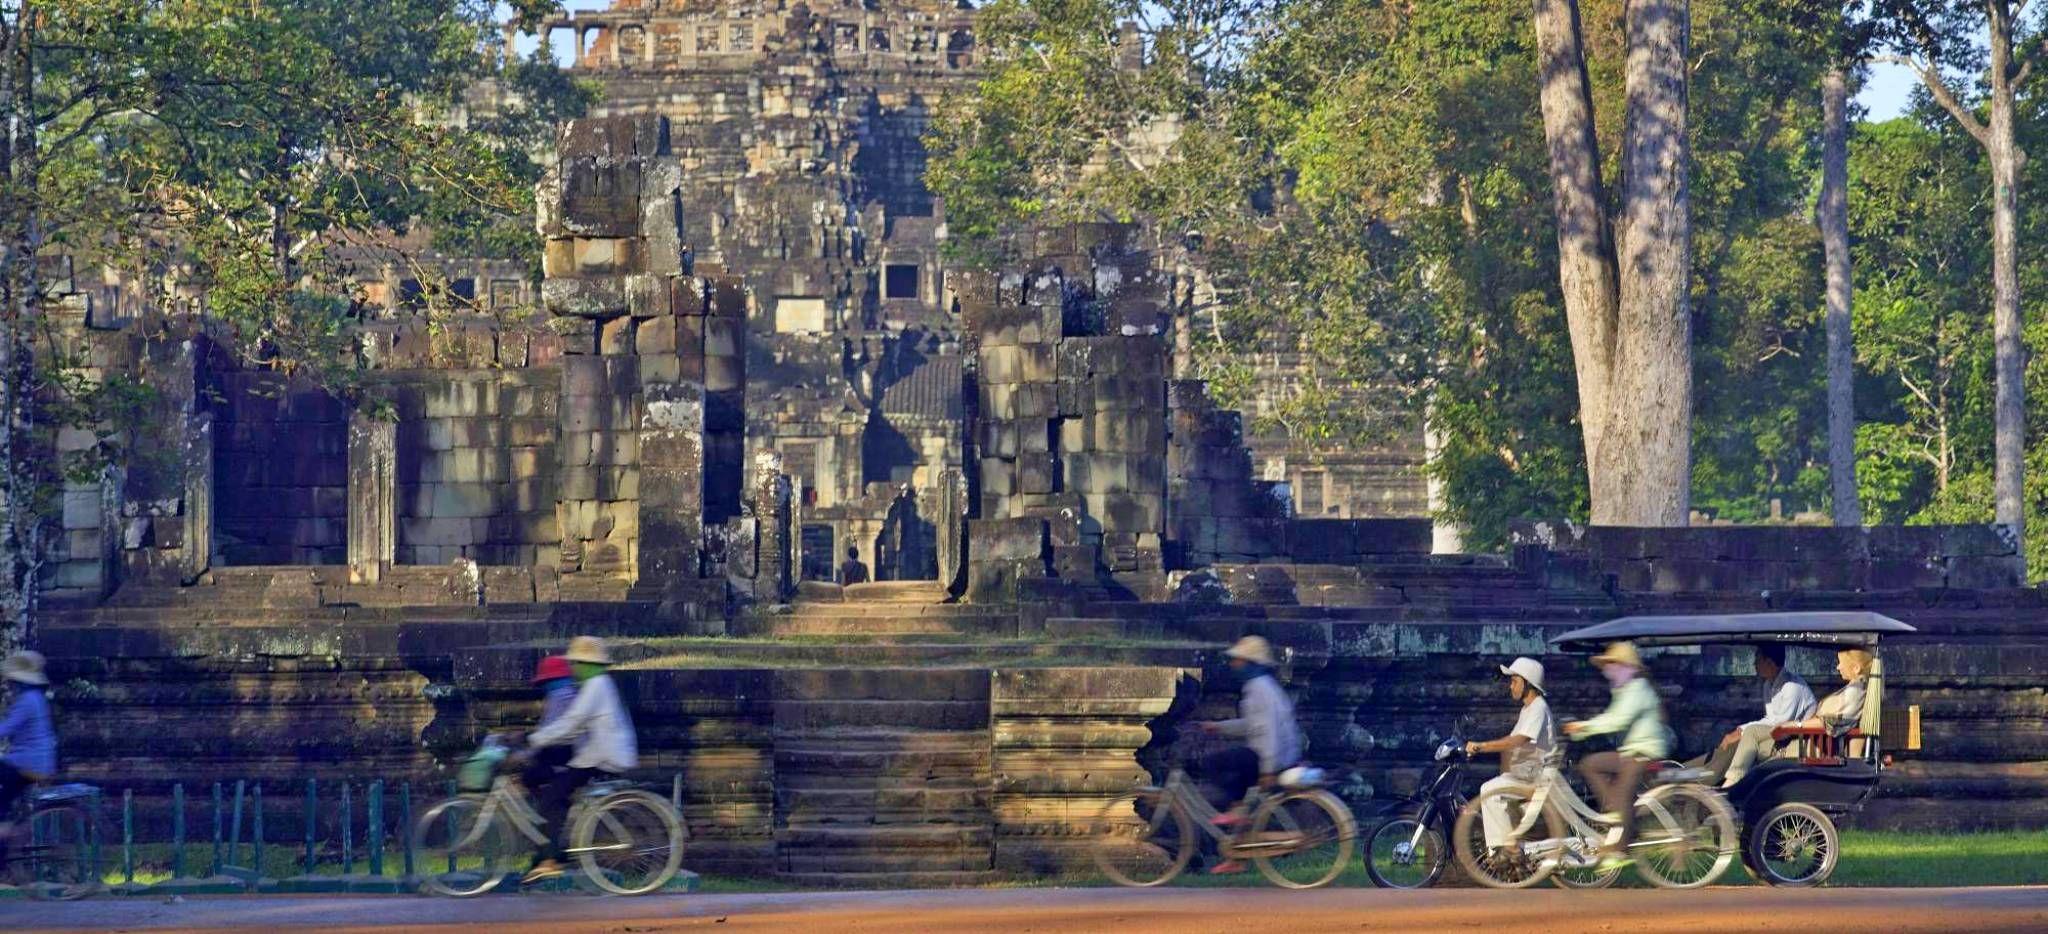 Radfahrer vor dem Kambodschanischen Tempel Angkor Thom, nahe dem Hotel Amansara